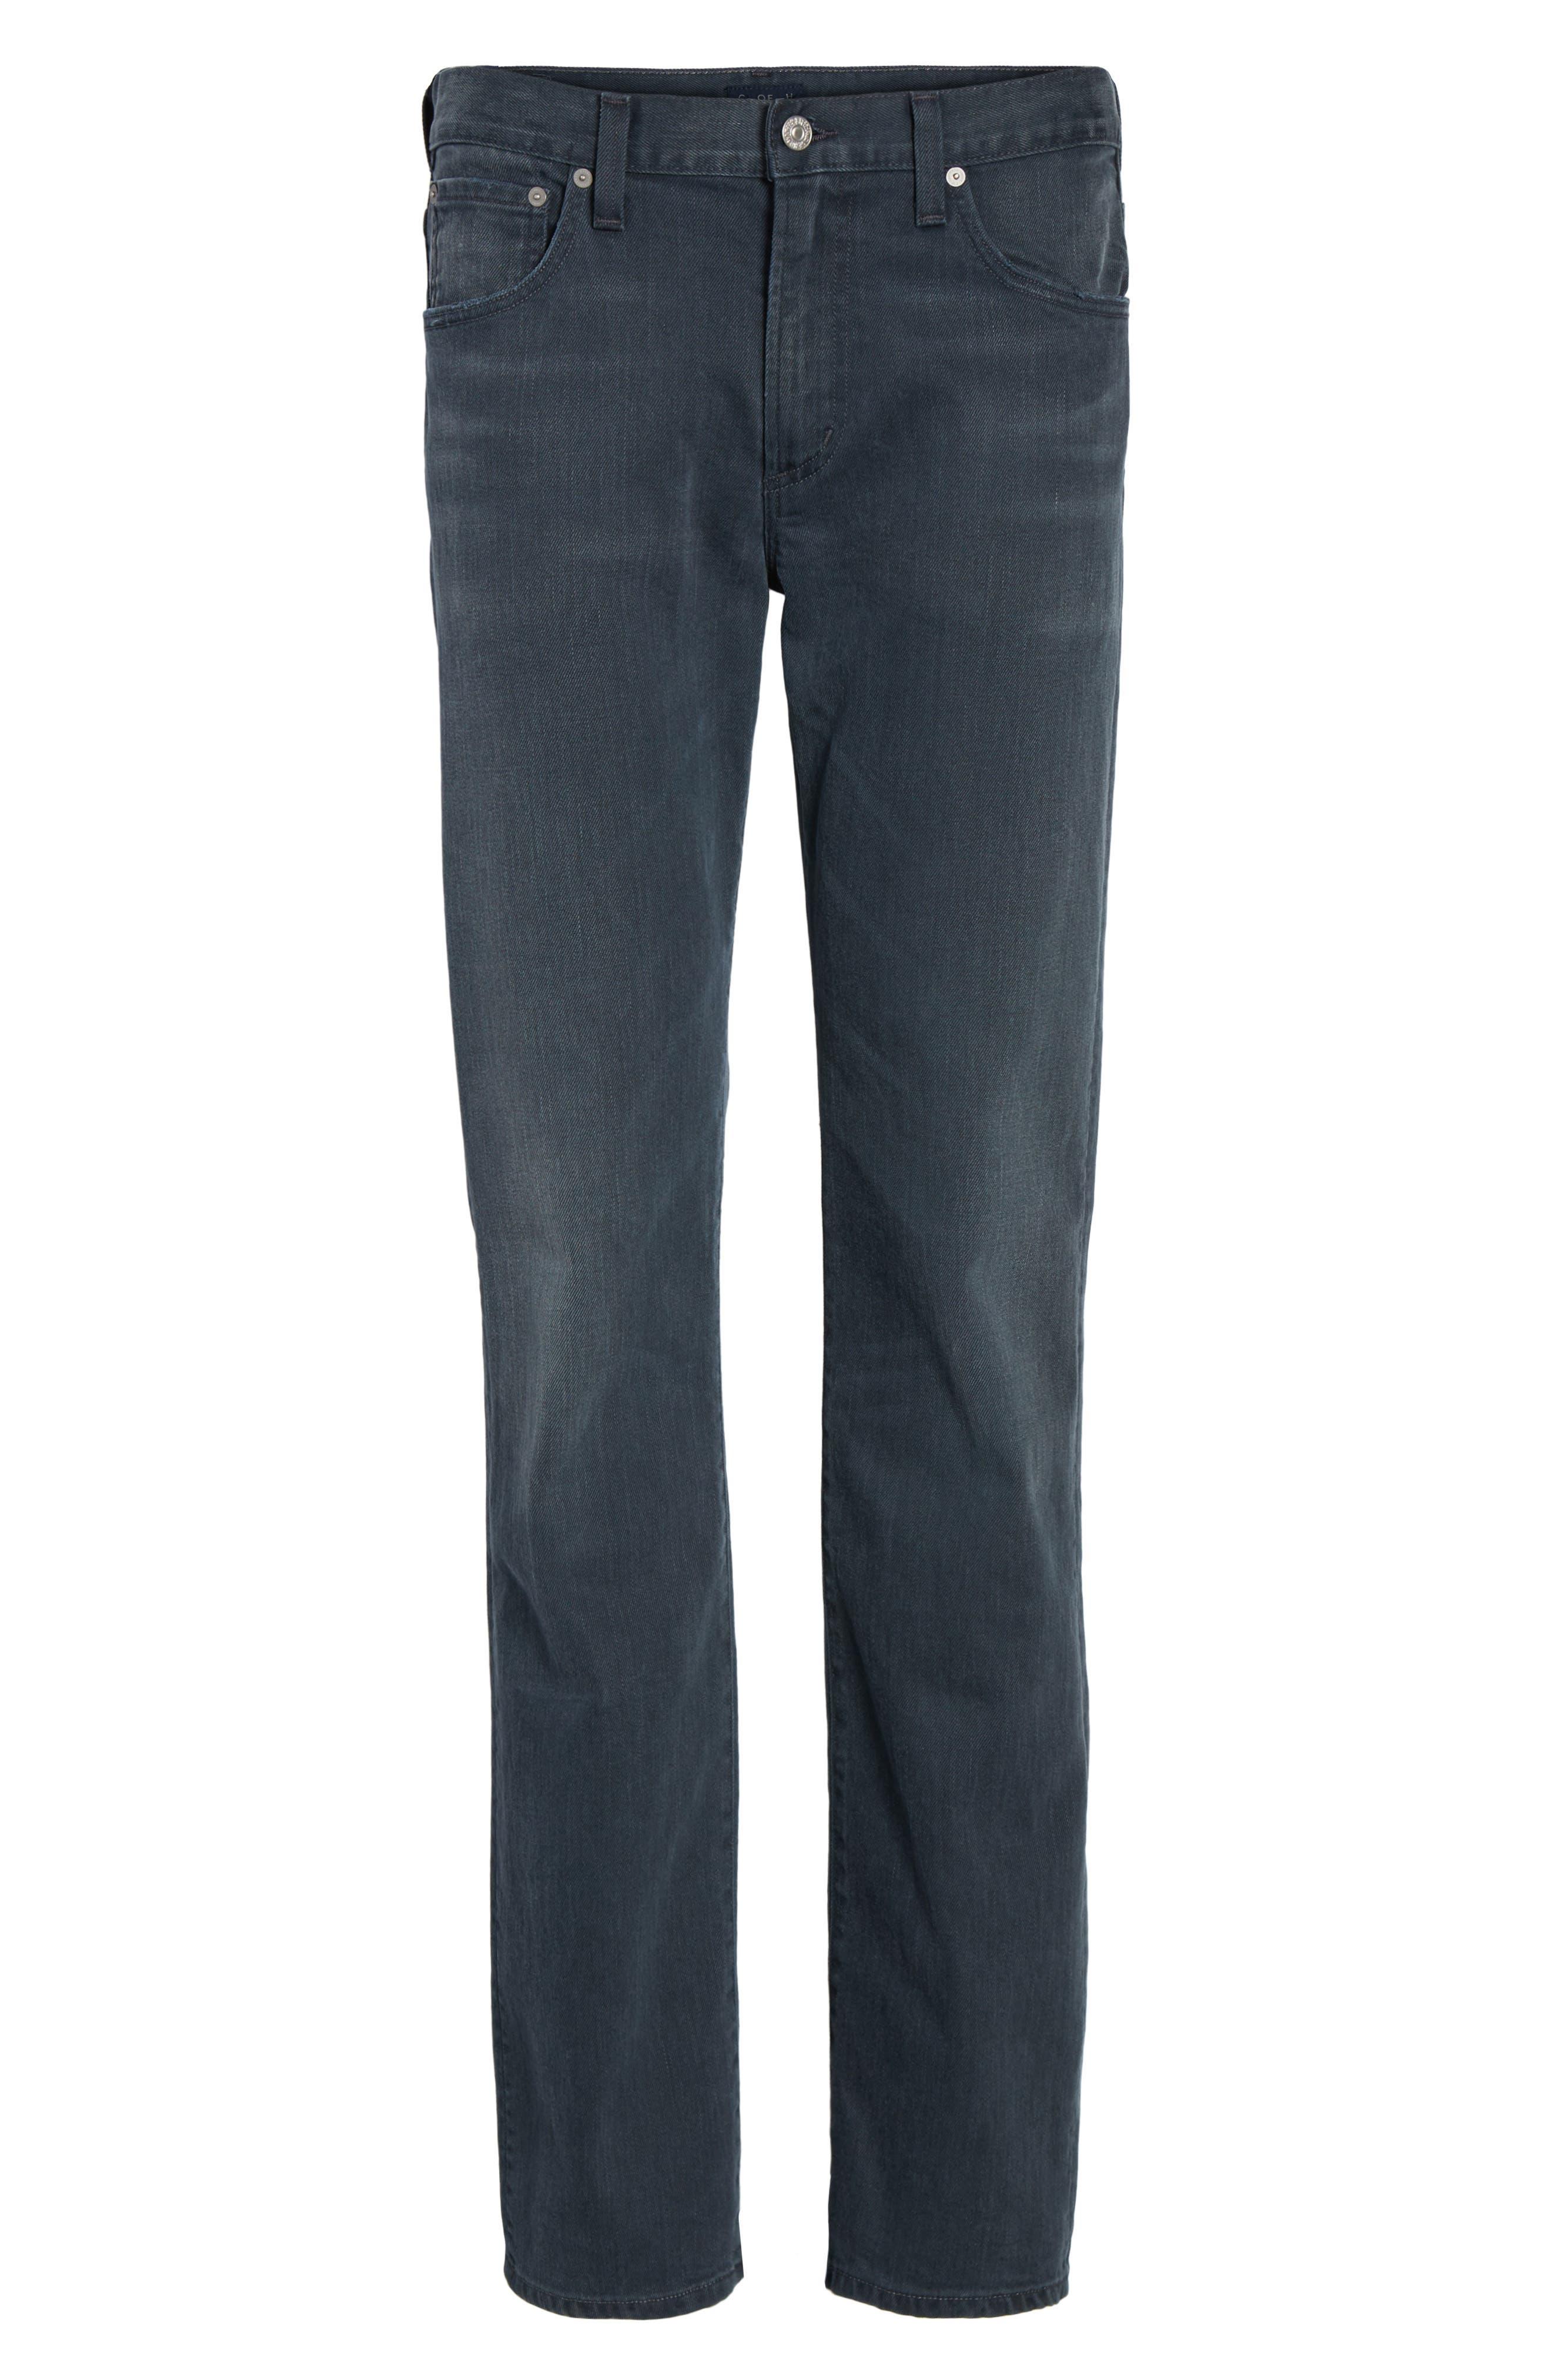 Sid Straight Leg Jeans,                             Alternate thumbnail 6, color,                             BLUE SKIES